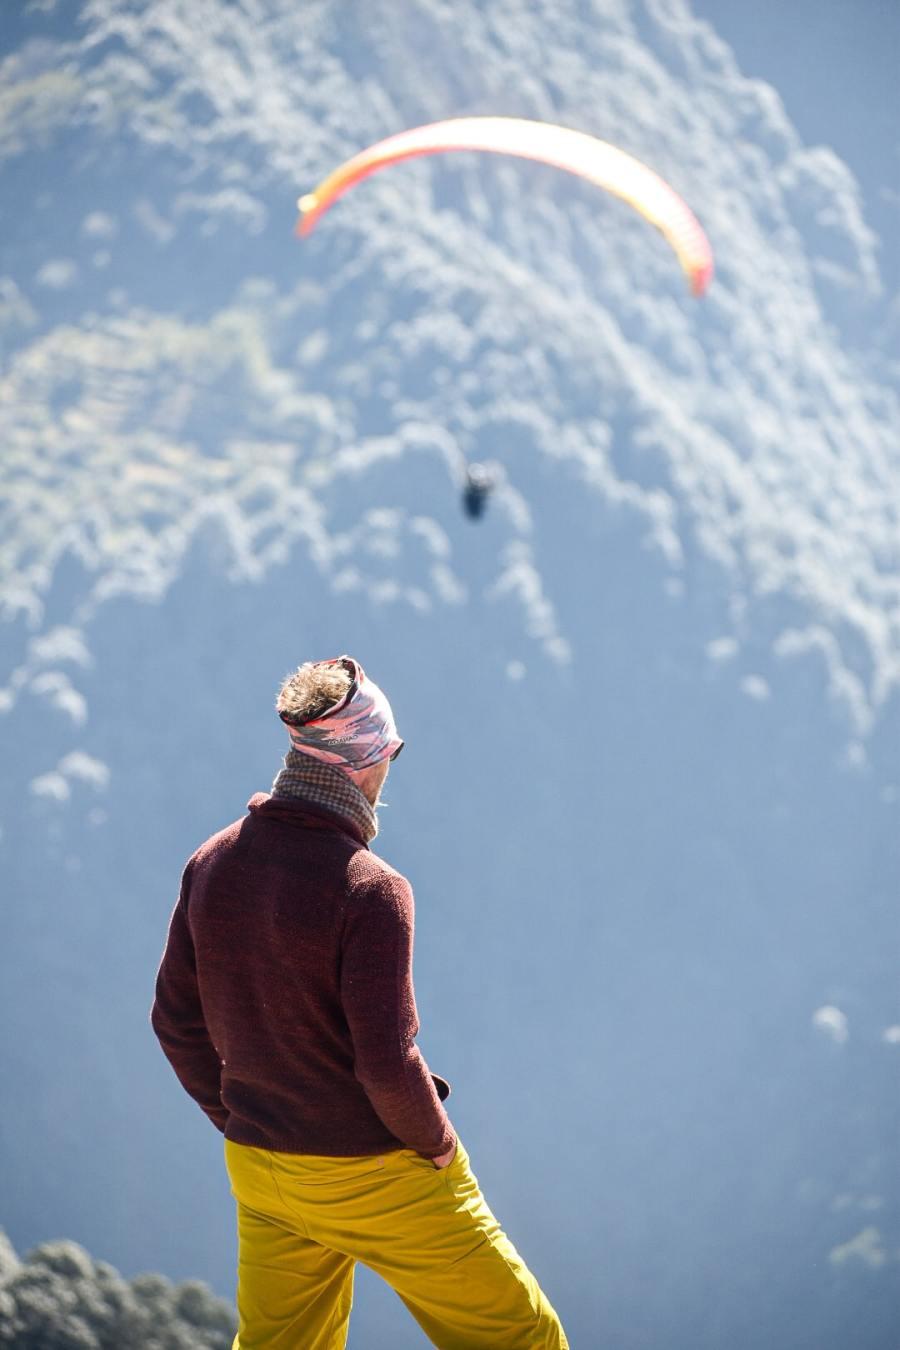 Visit Paragliding take-off site